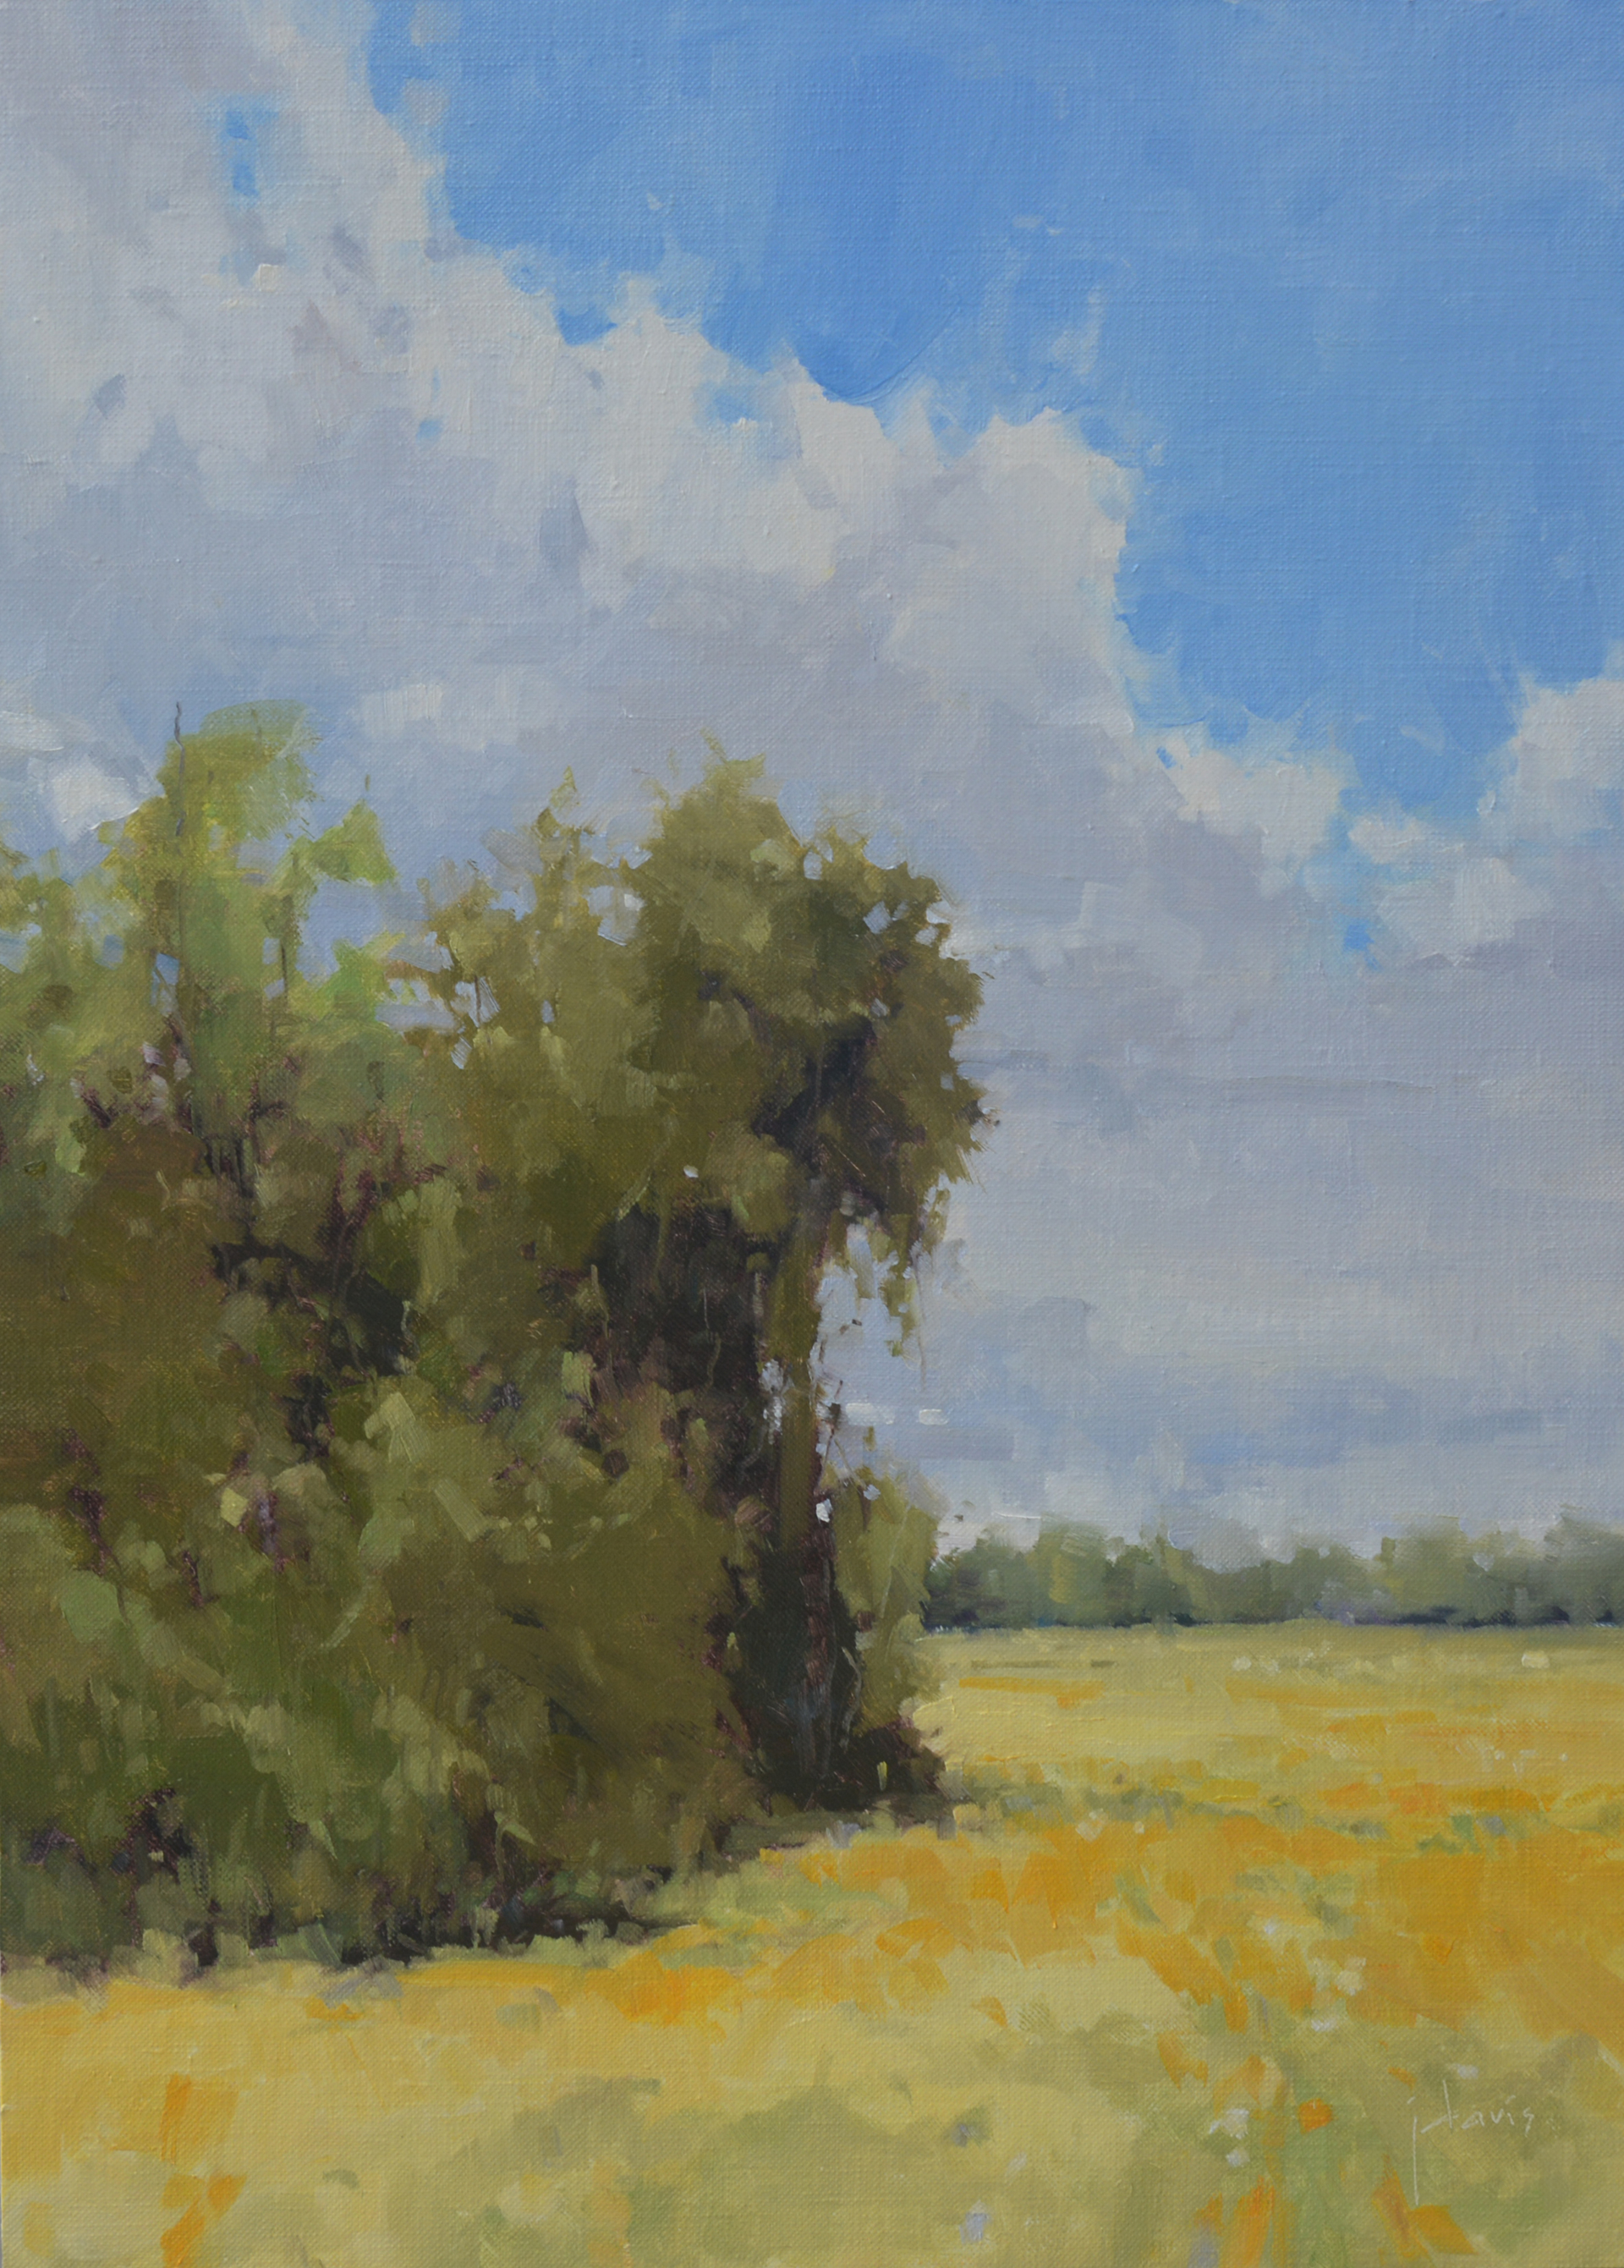 Approaching Rain by Julie Davis